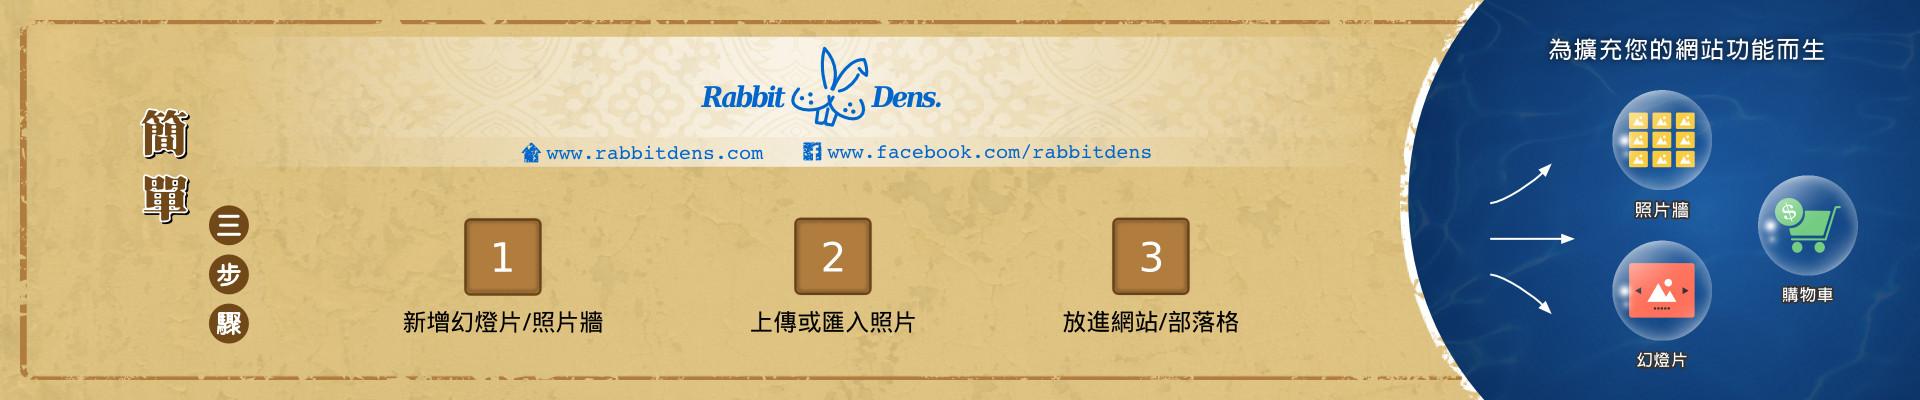 Rabbit Dens